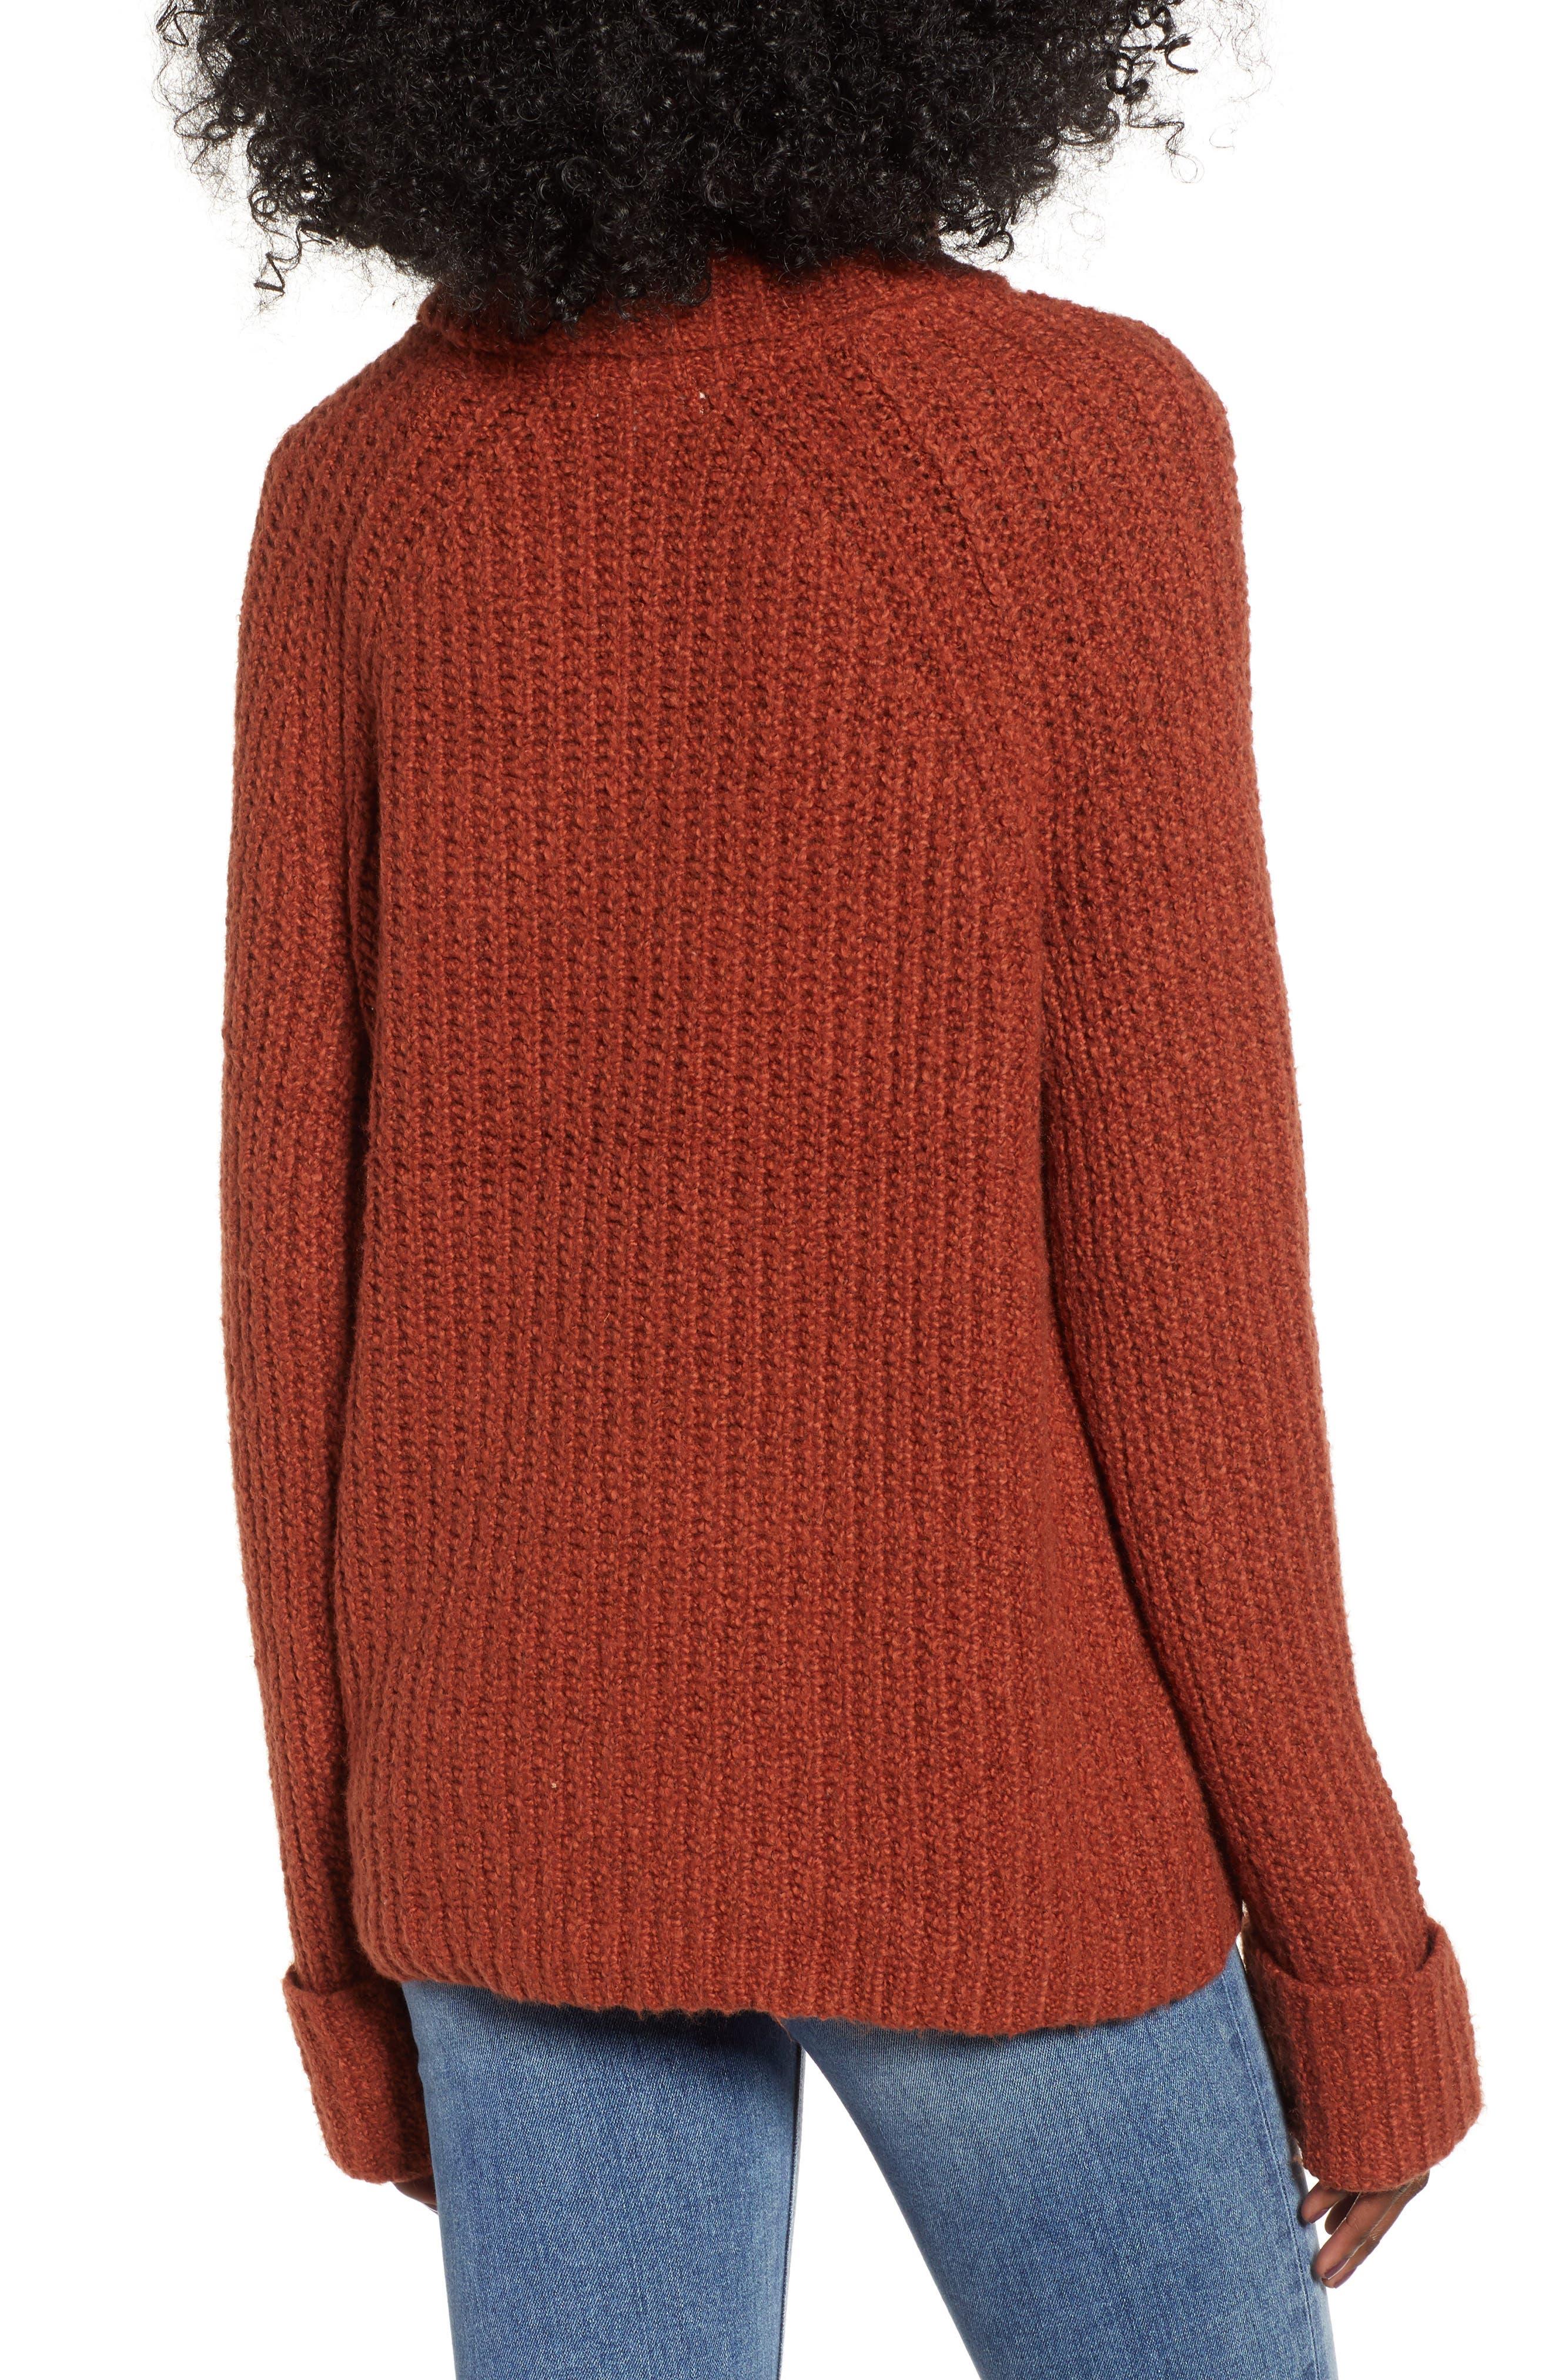 Cozy Turtleneck Sweater,                             Alternate thumbnail 2, color,                             RUST SEQUOIA